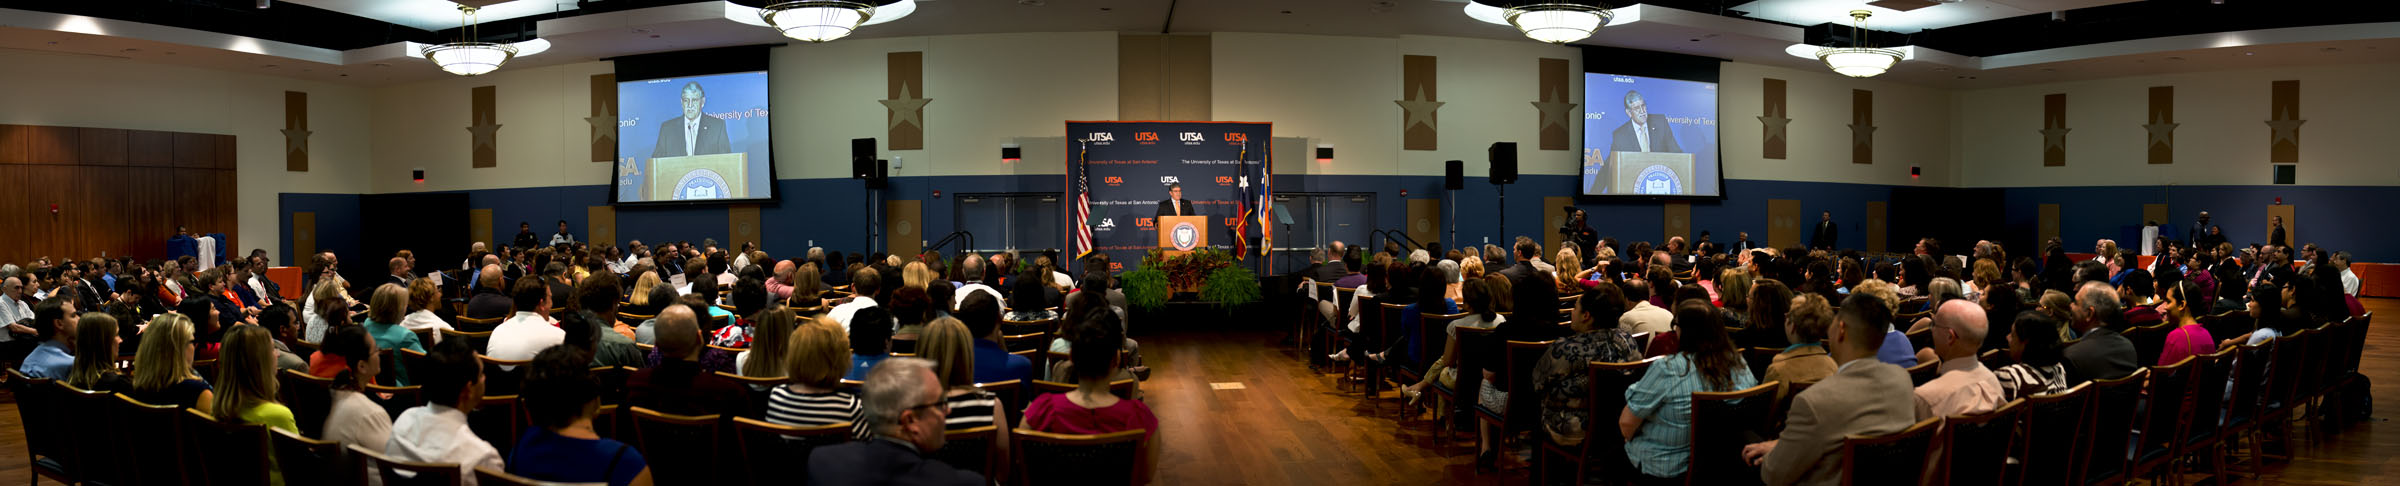 Panoramic view of UTSA's 2013 State of the University Address. Courtesy of UTSA.